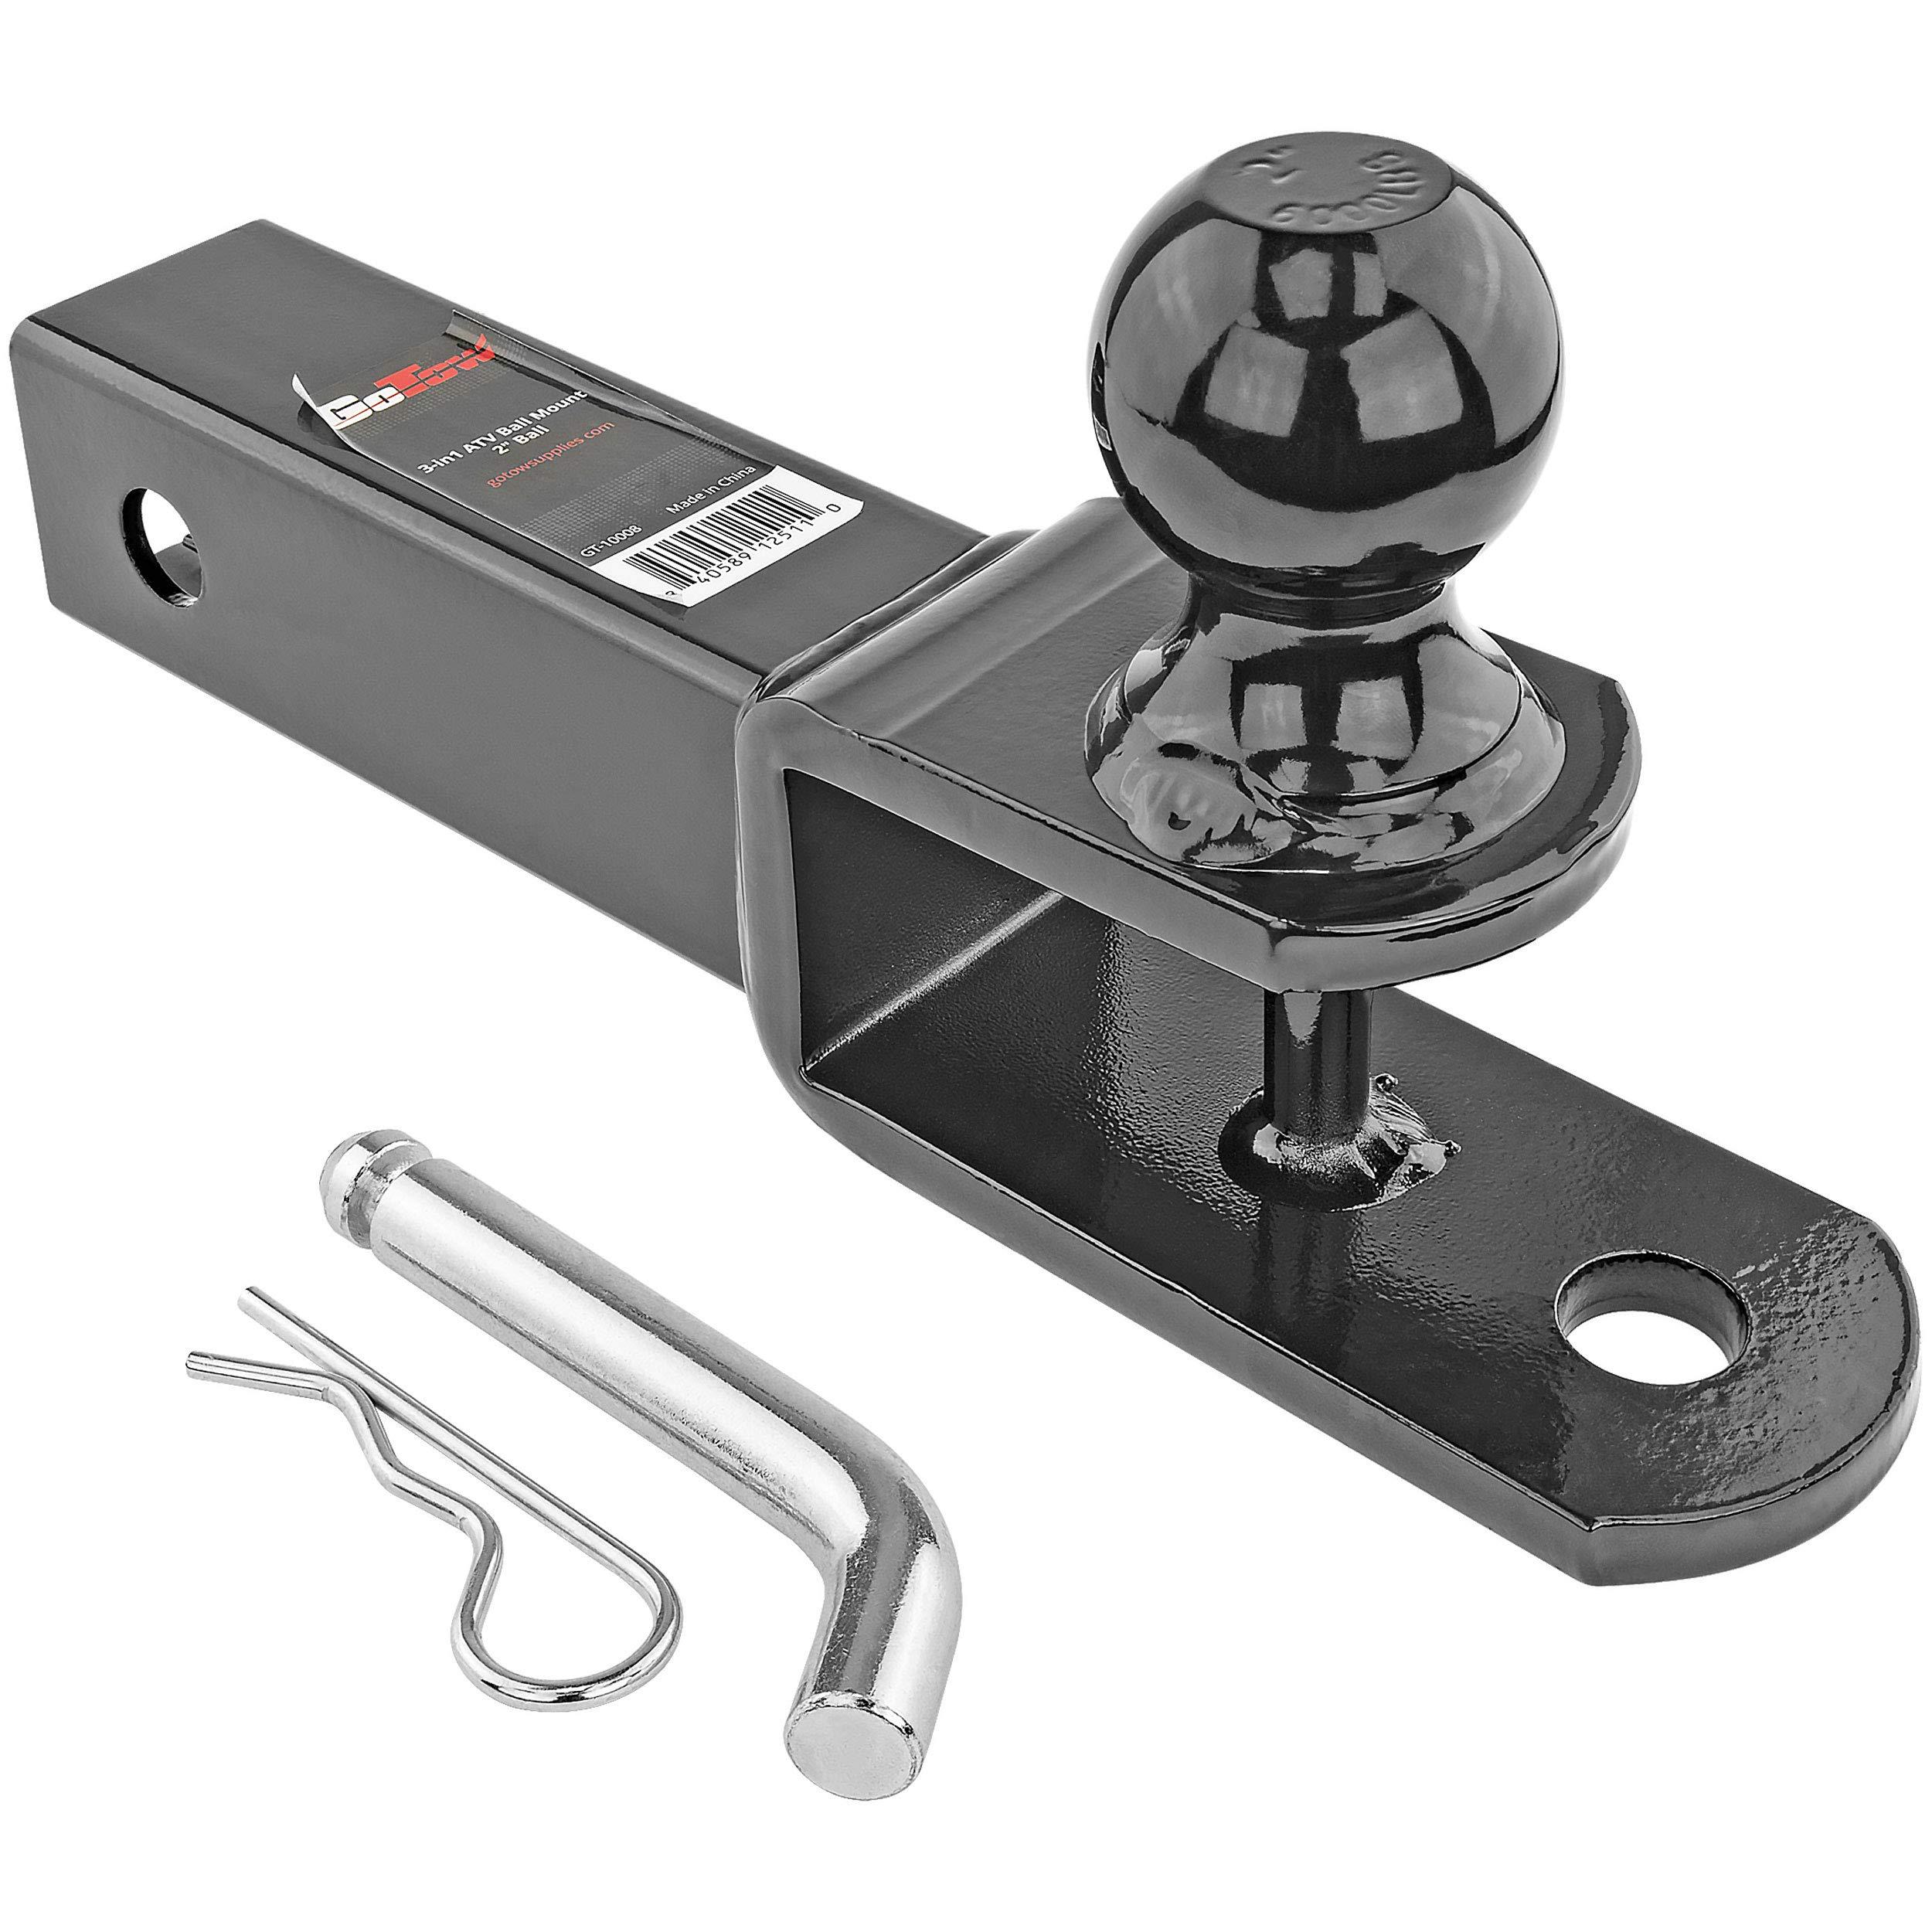 GoTow GT-10008 ATV UTV 3 In 1 Ball Mount Hitch W/ Hitch Pin Fits 2-inch Receiver Class III 6000lb 2-inch Ball